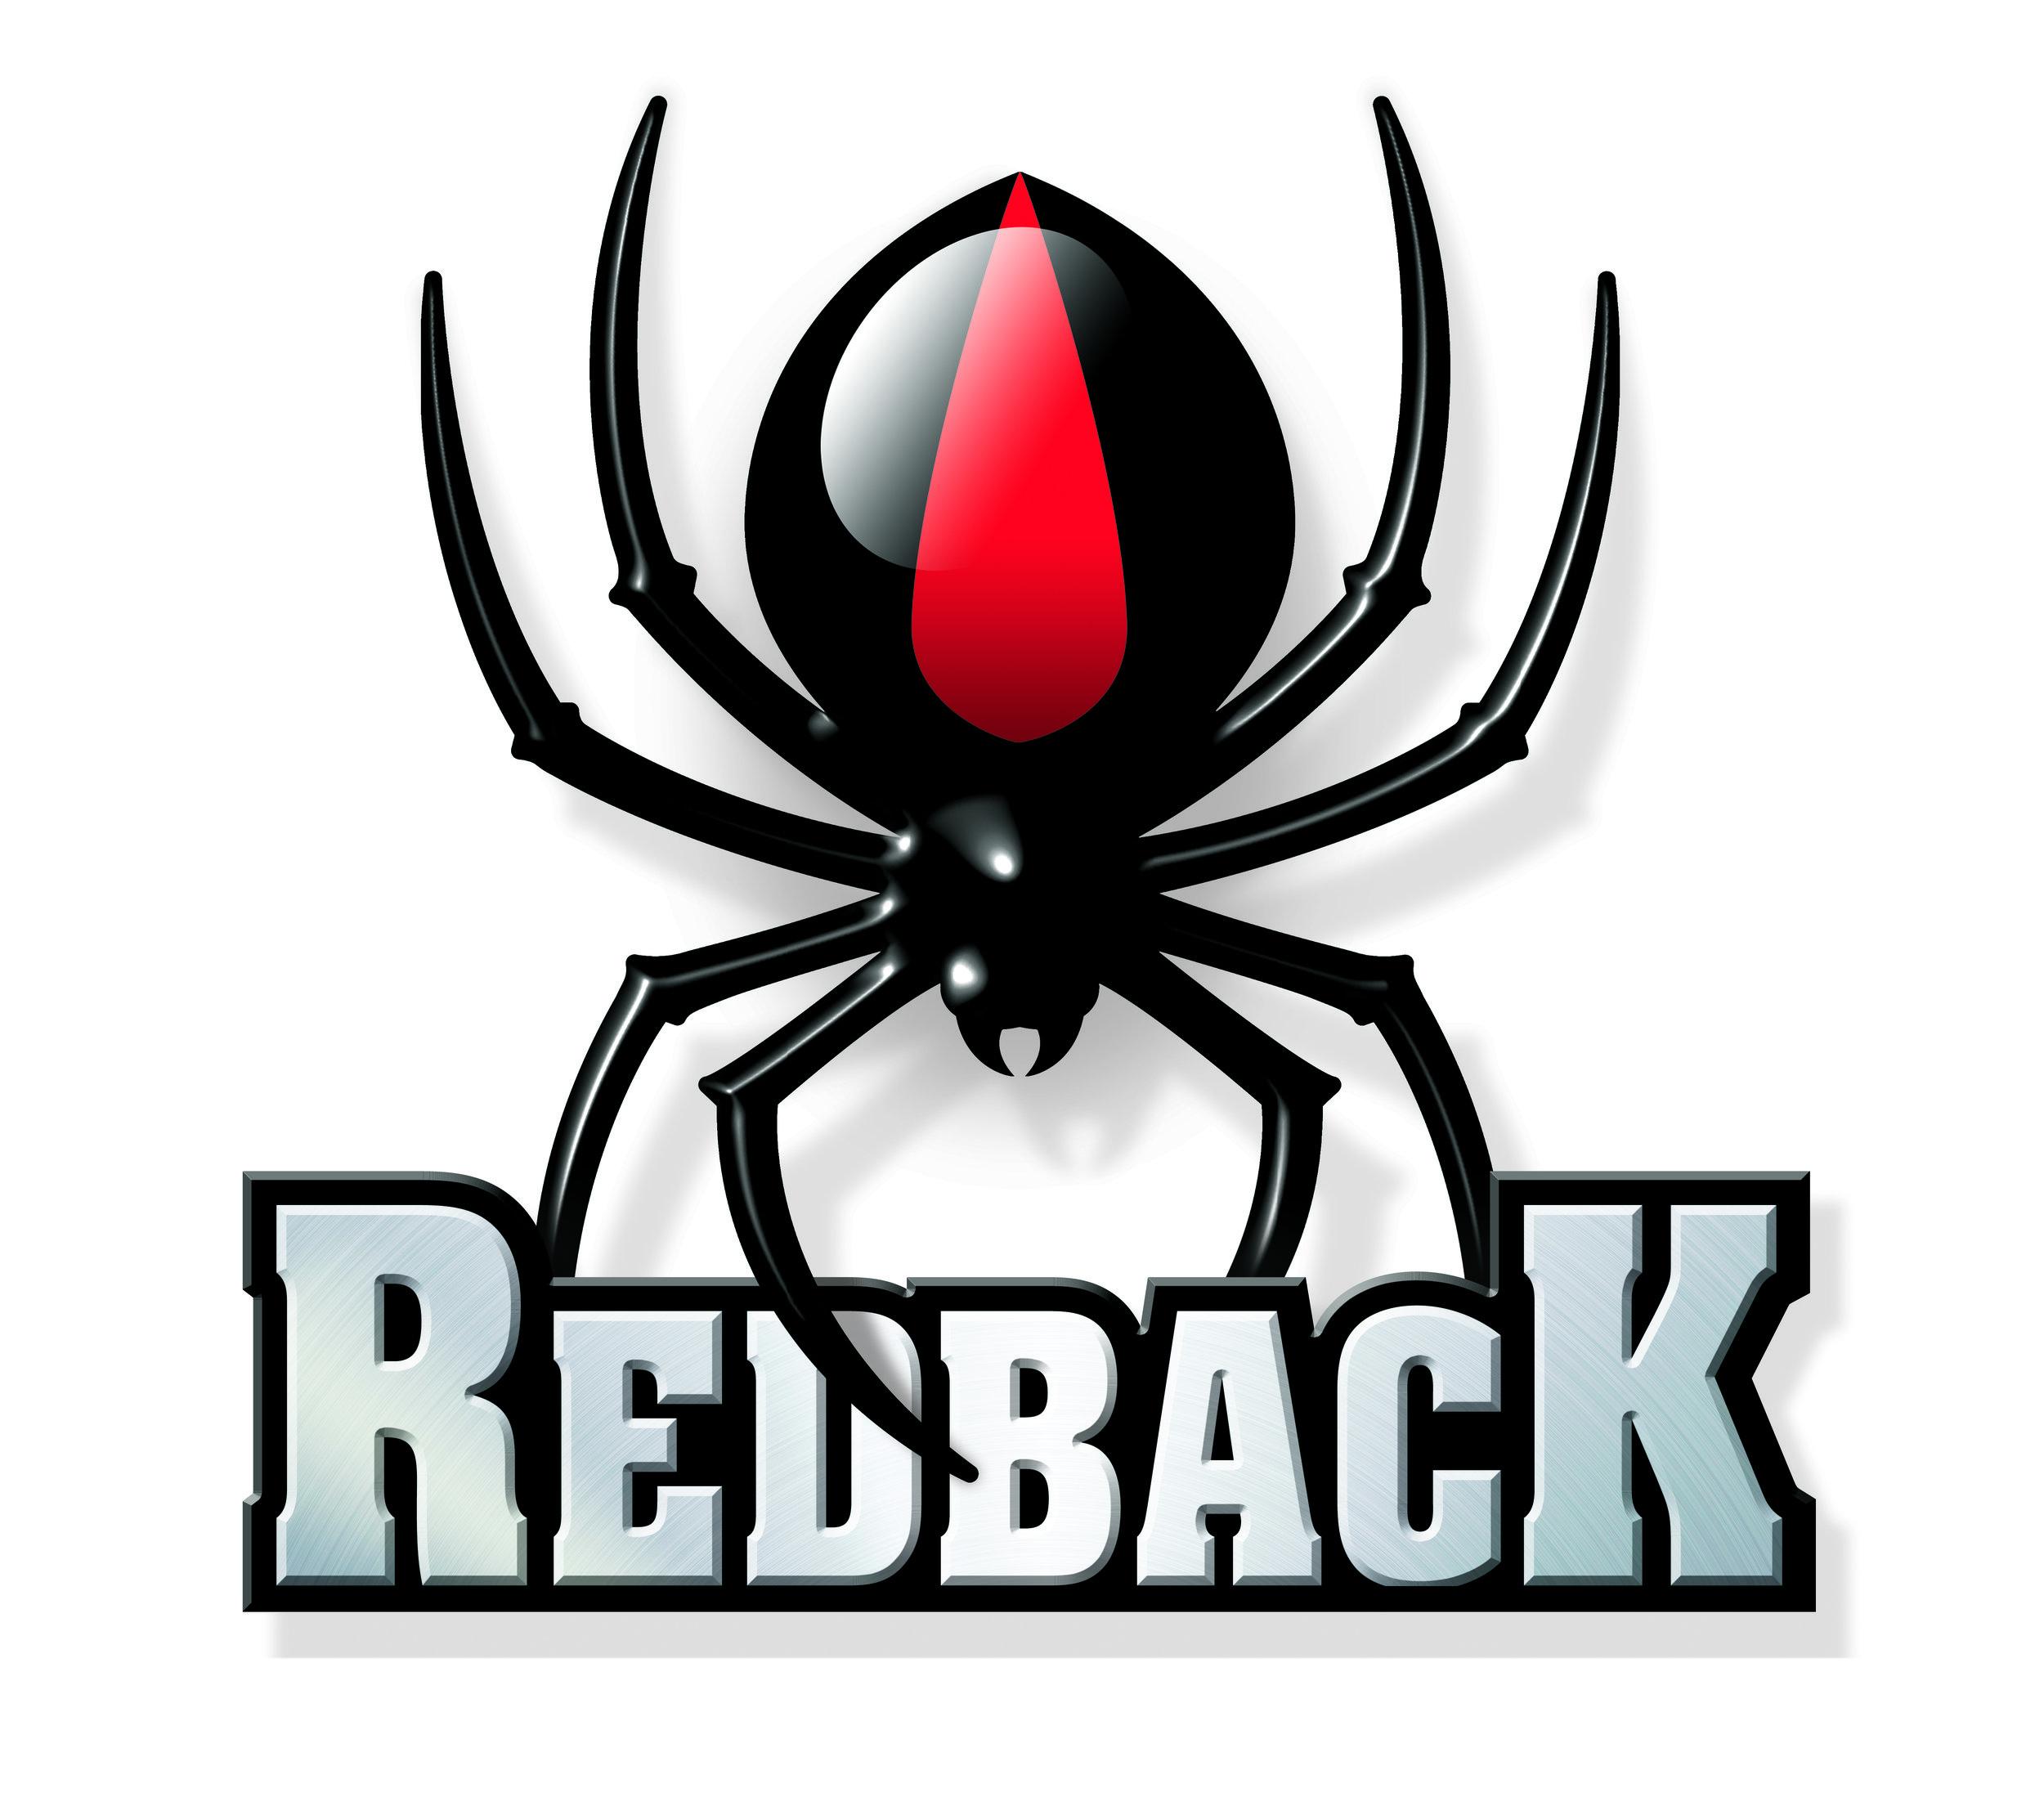 Redback vert large CMYK.jpg